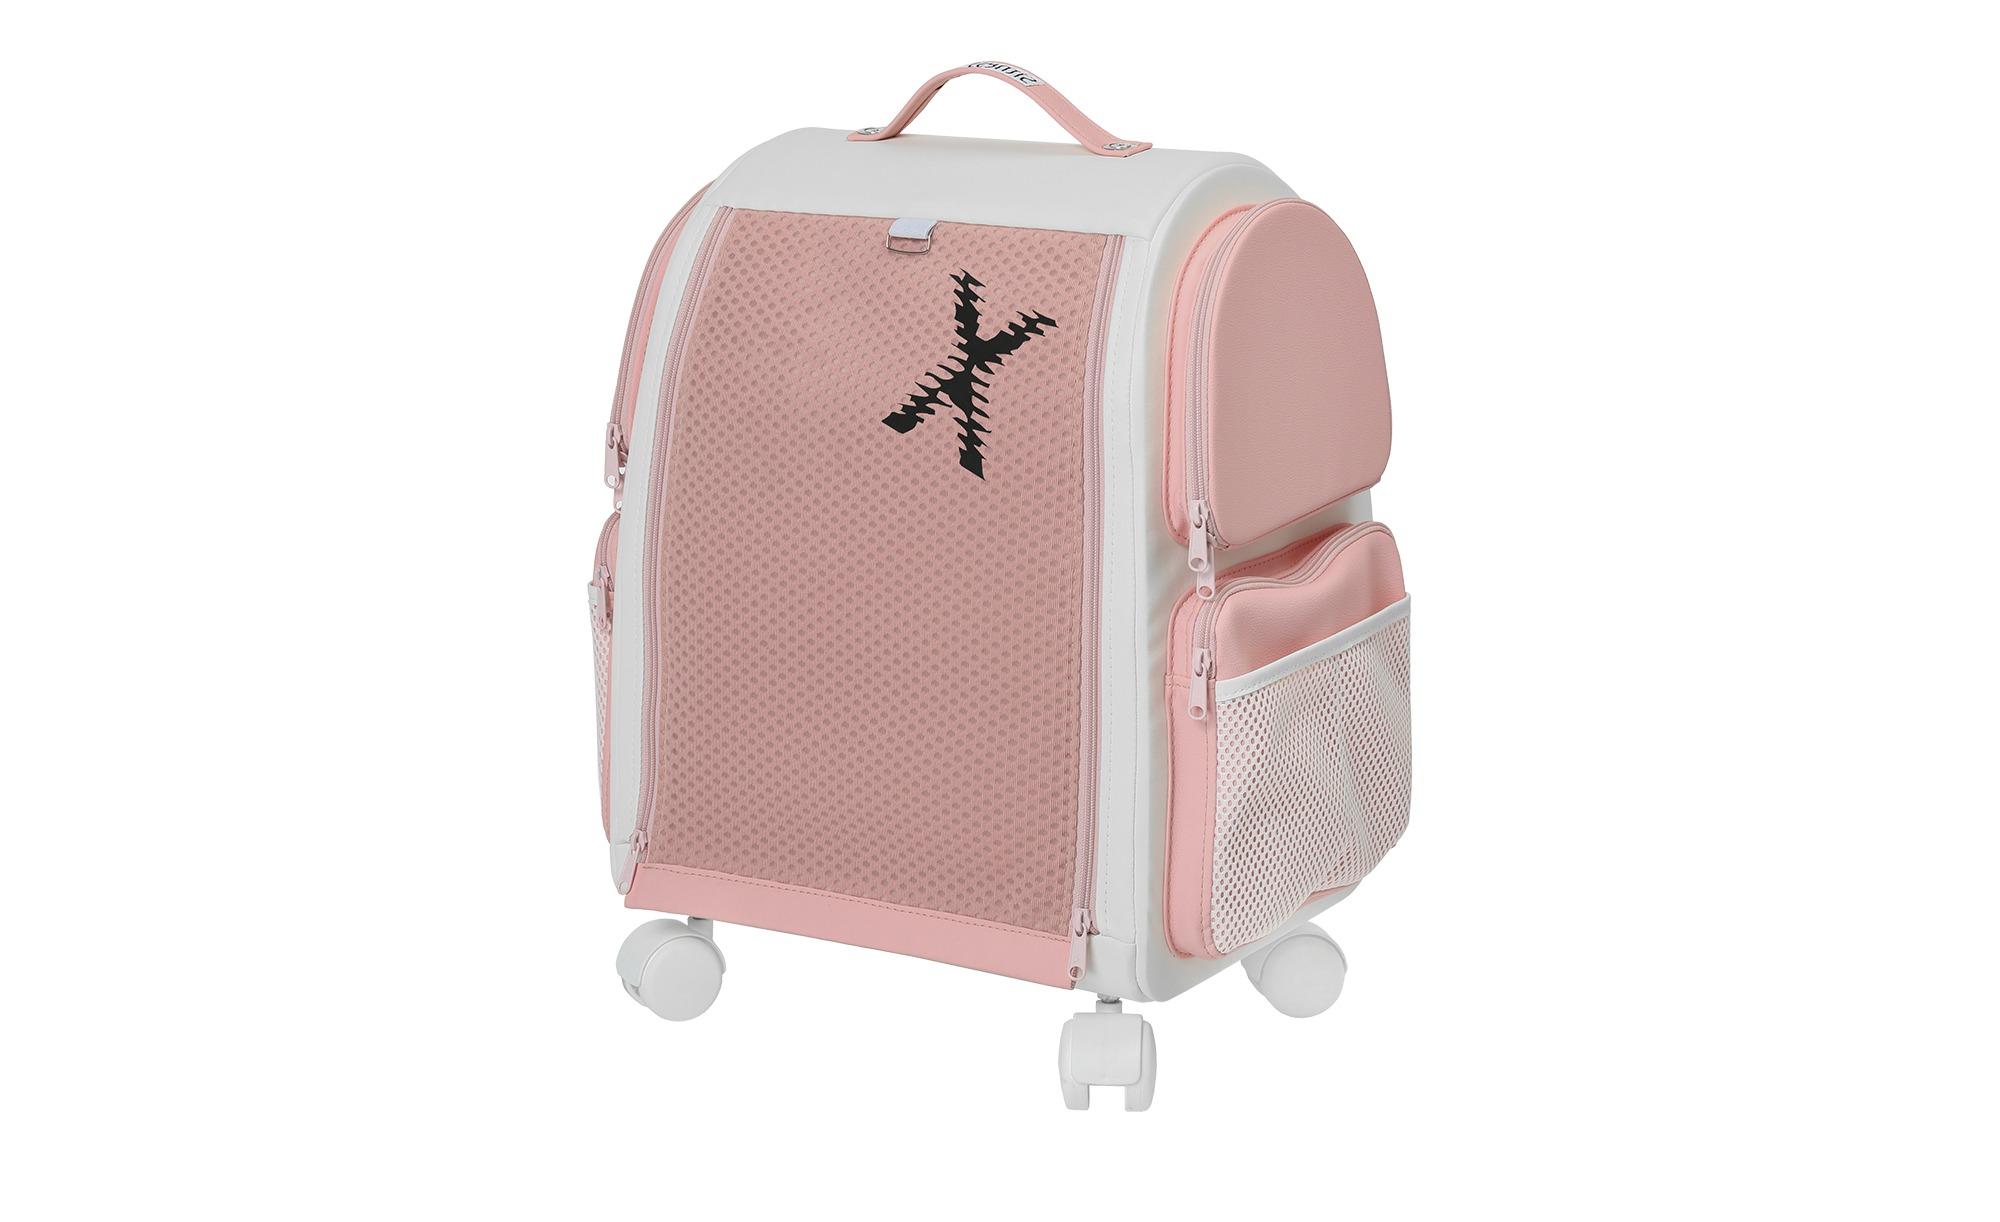 Sitness X Rollcontainer   Sitness X Container ¦ rosa/pink Schränke > Rollcontainer - Höffner